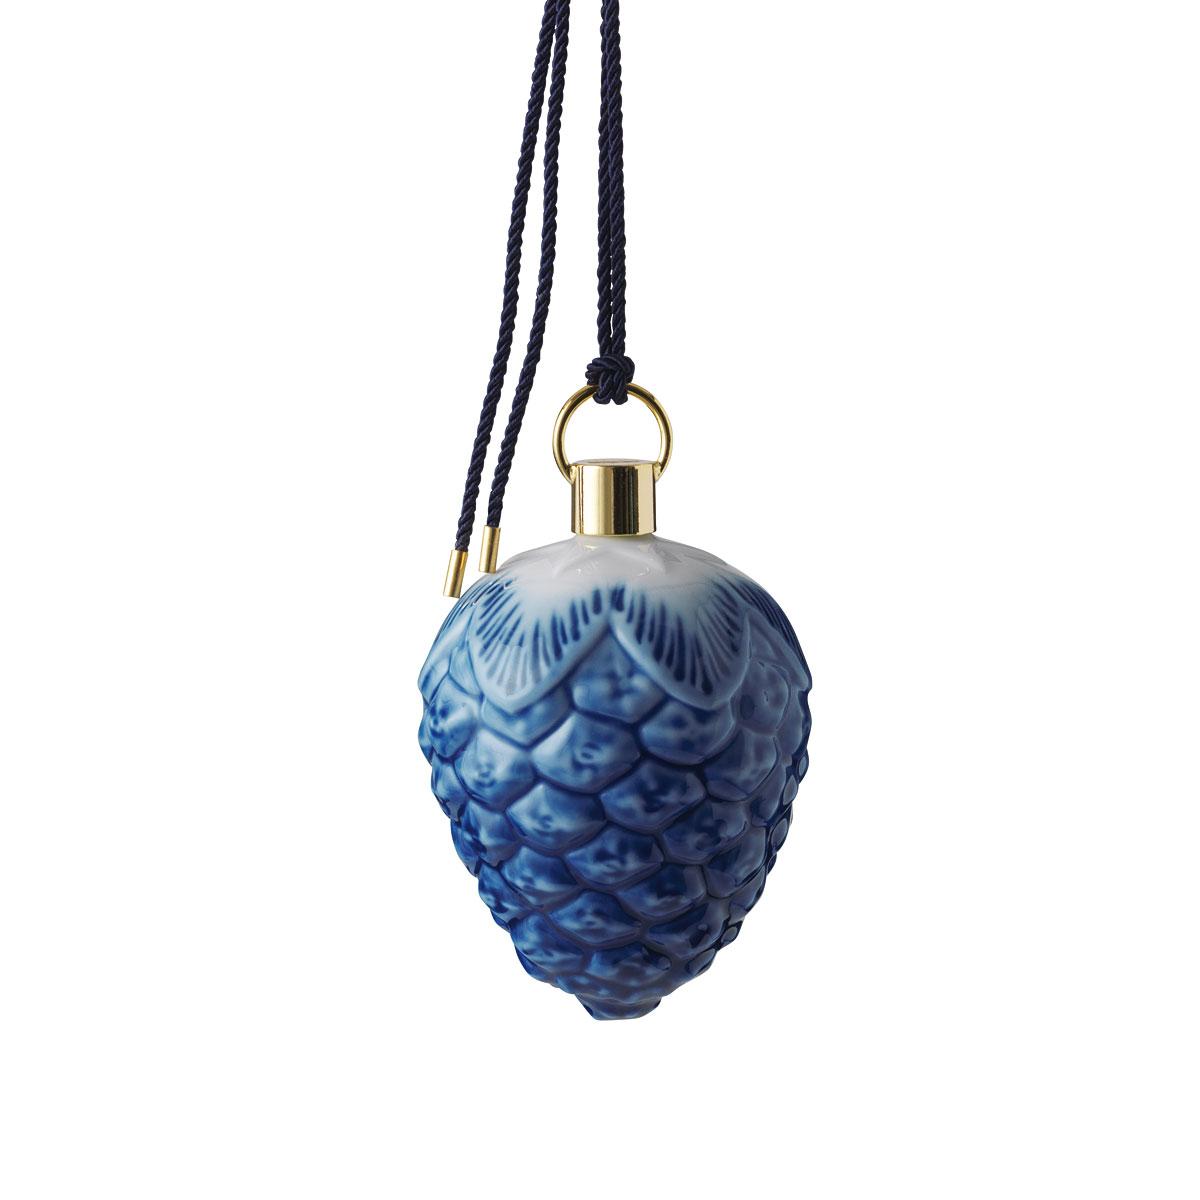 Royal Copenhagen 2020 Pinecone Ornament